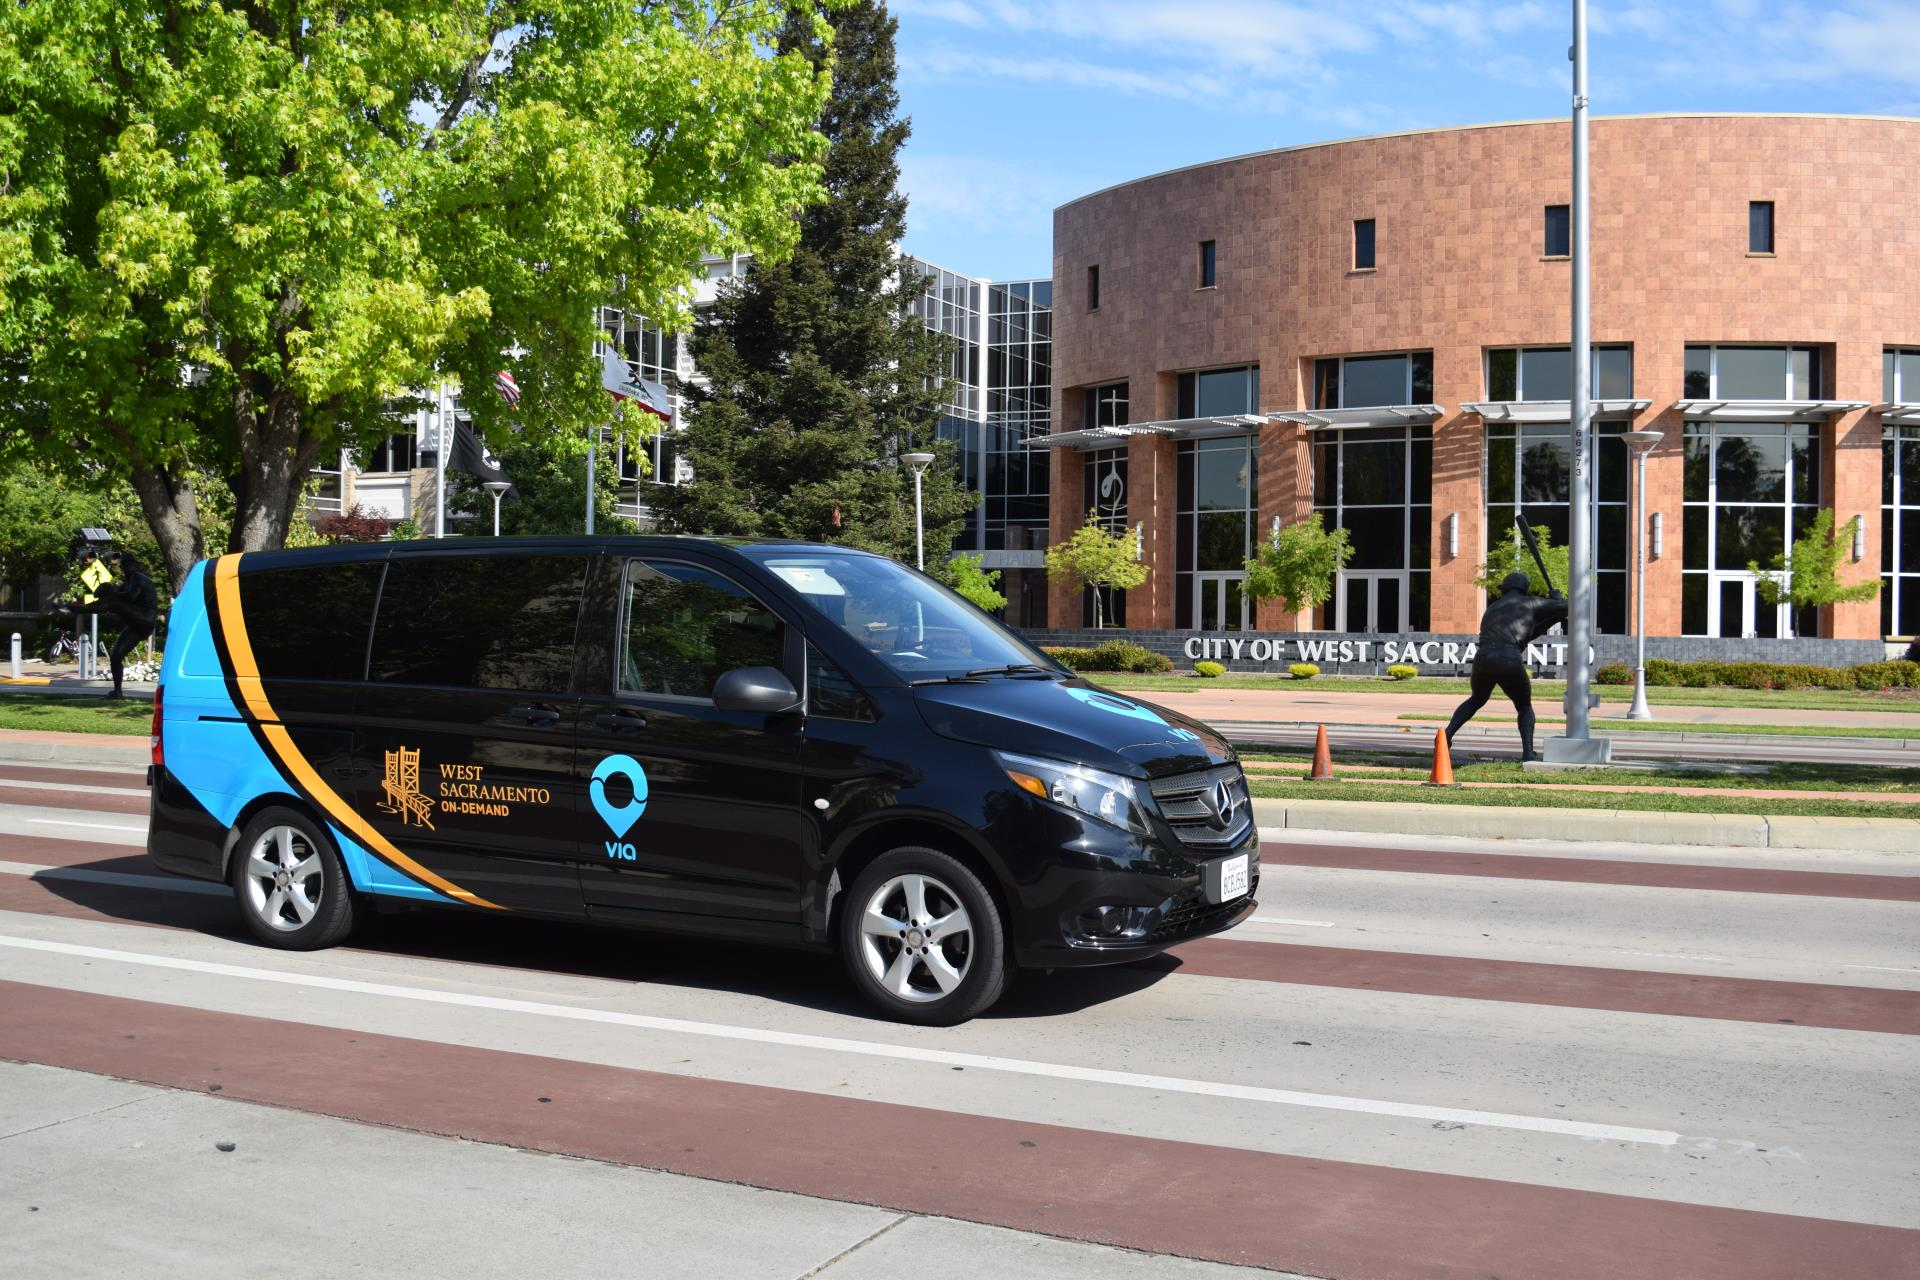 via van drives by city hall